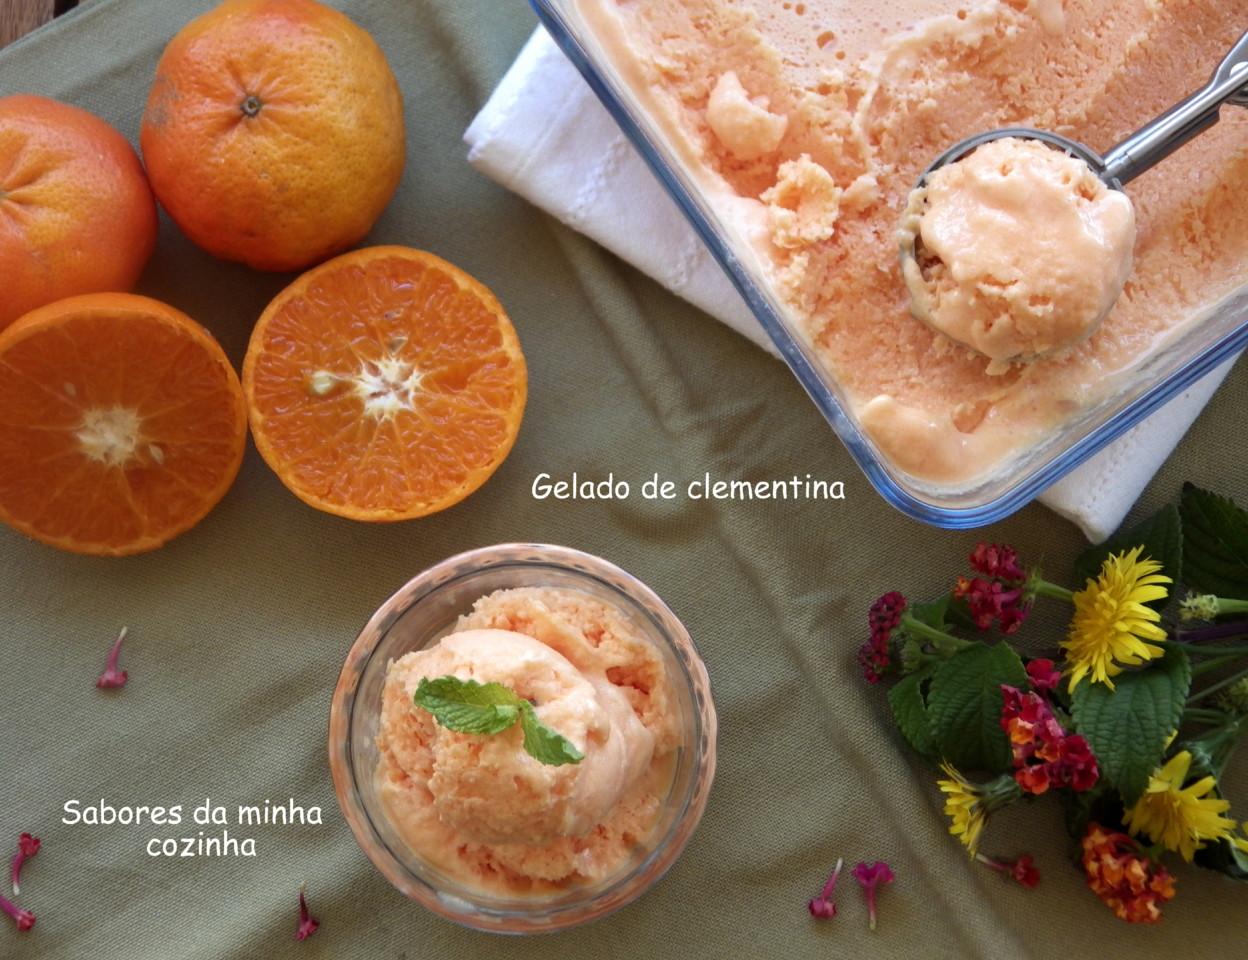 IMGP8583-gelado de clementina-Blog.JPG